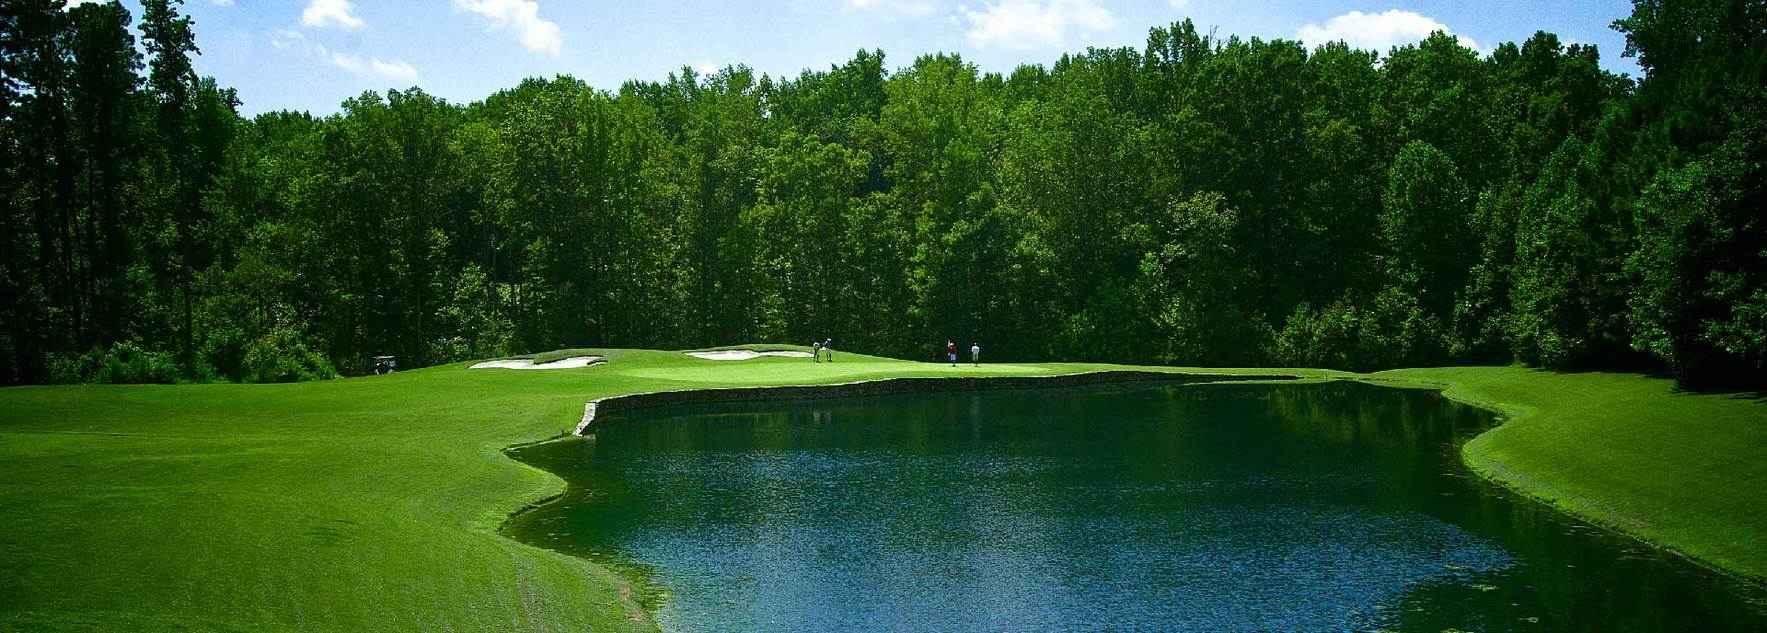 Golf Challenge 2019 - Rocky Mount image